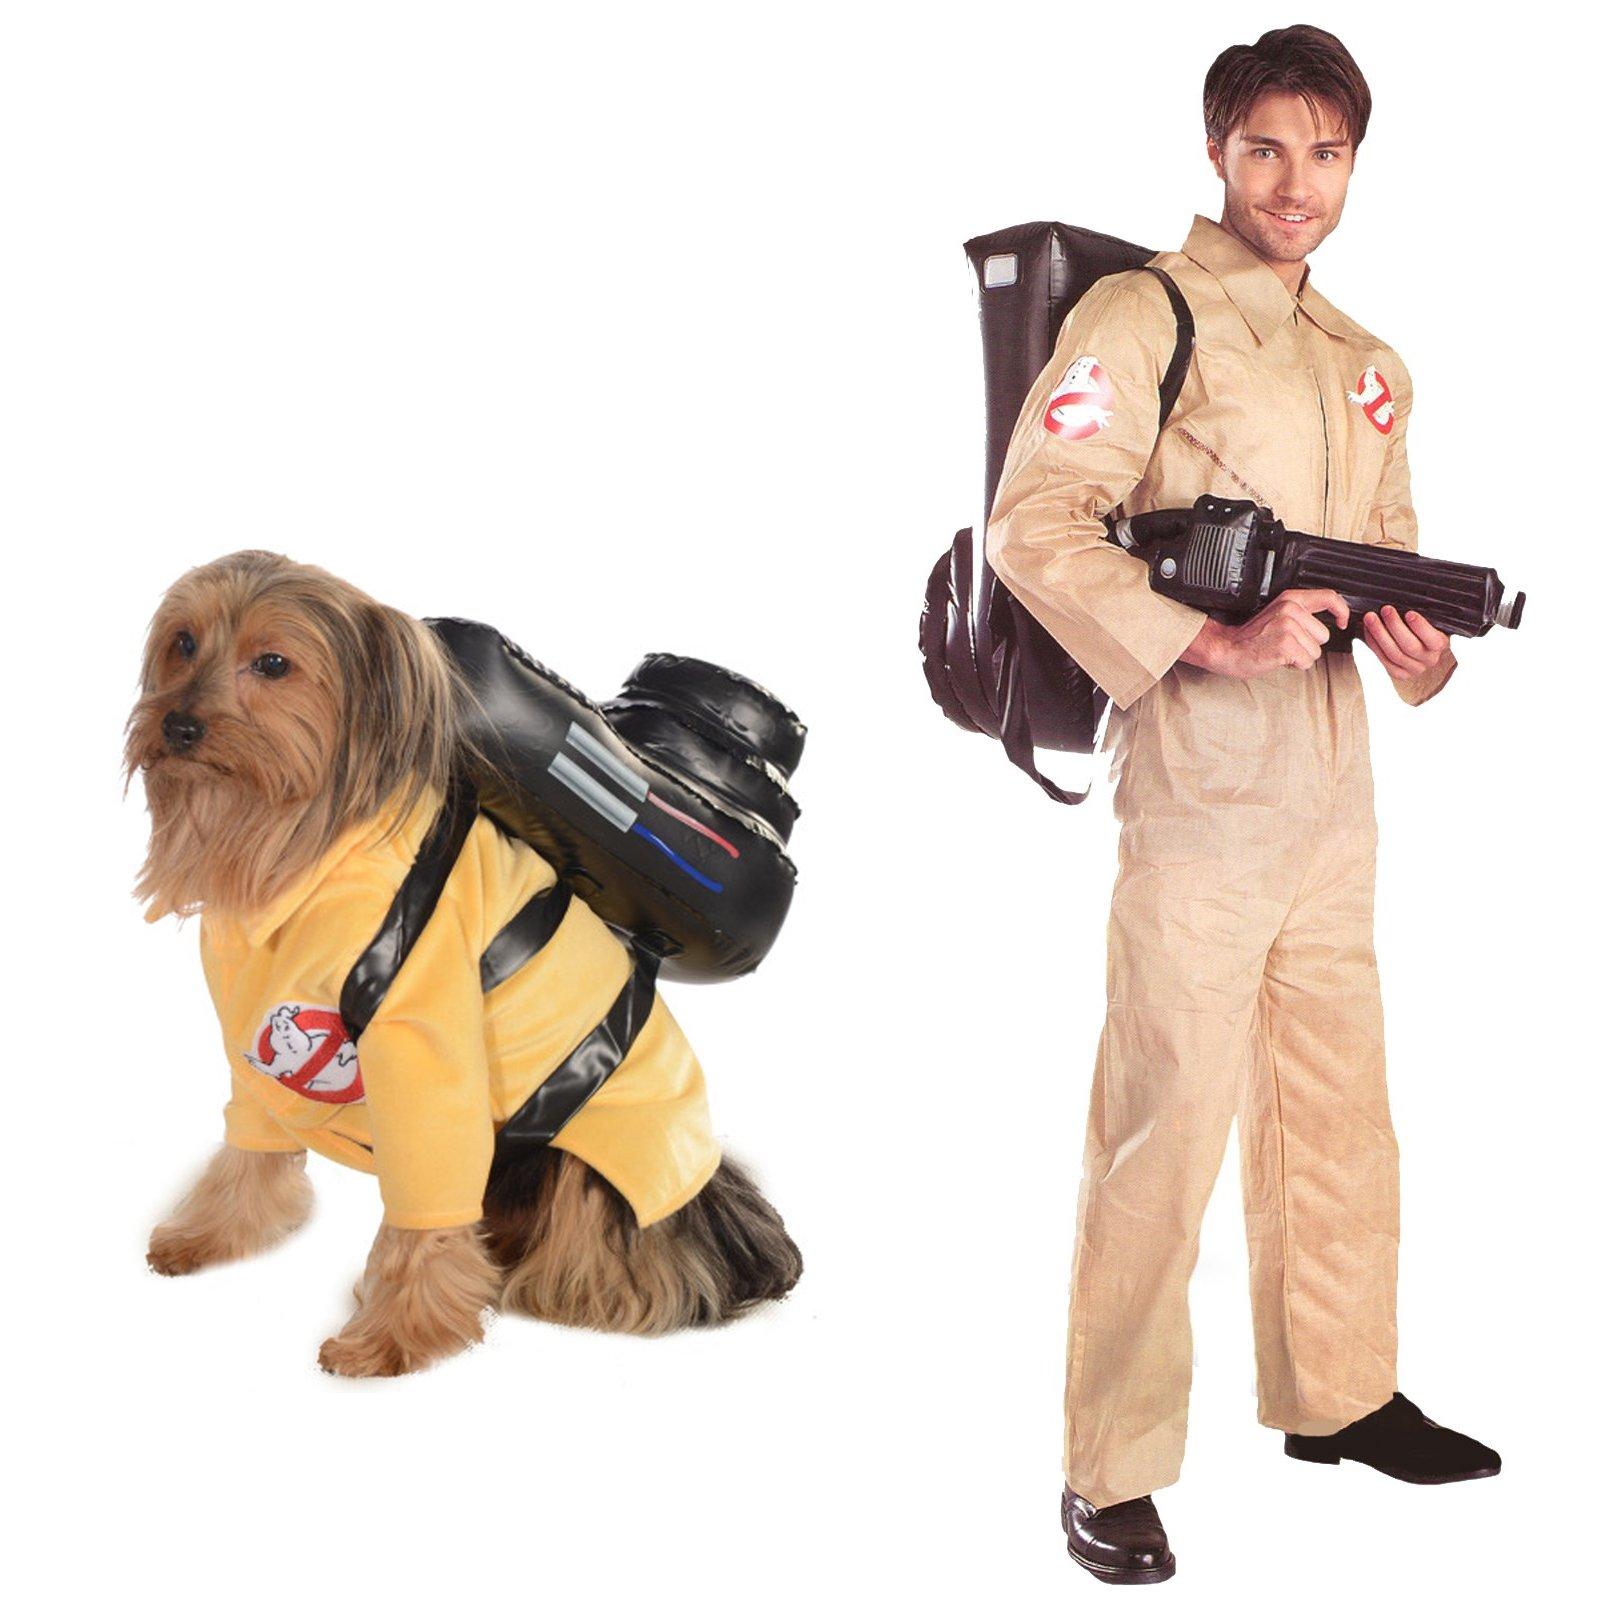 Ghostbusters Adult STD and Large Dog Costume Bundle Set